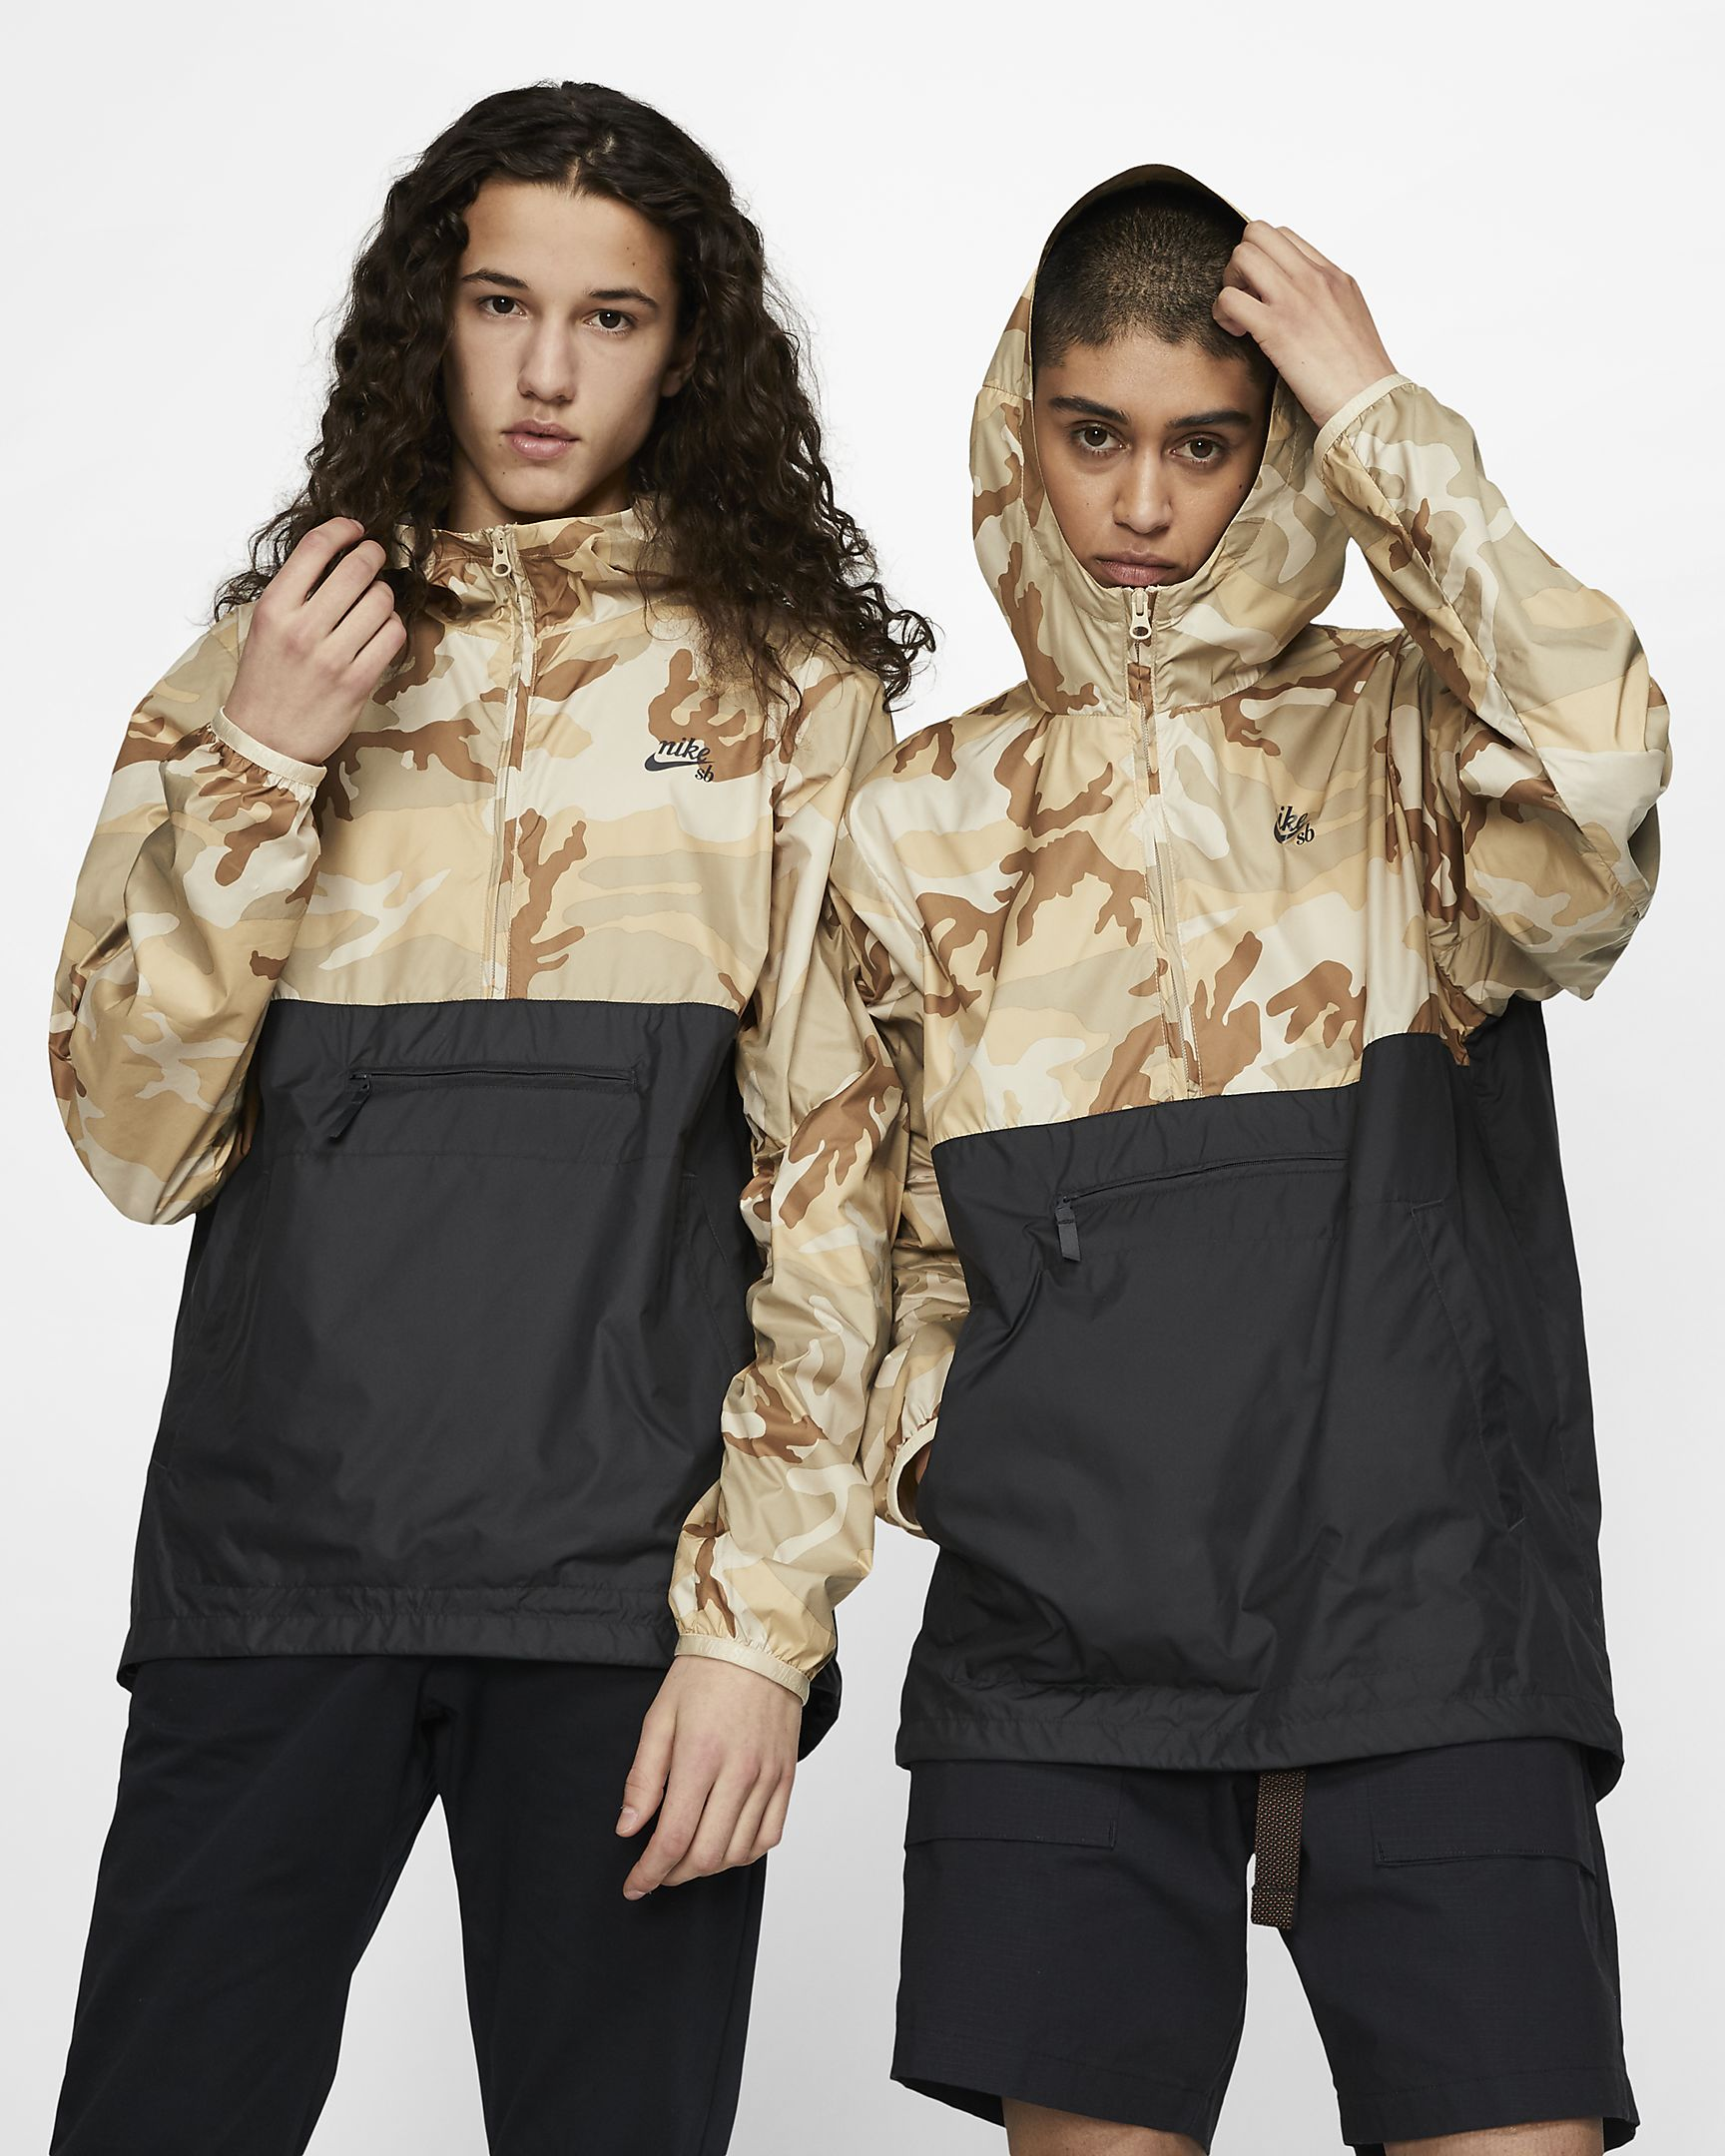 sb-mens-camo-skate-anorak-jacket-wRC6s7-3.jpg